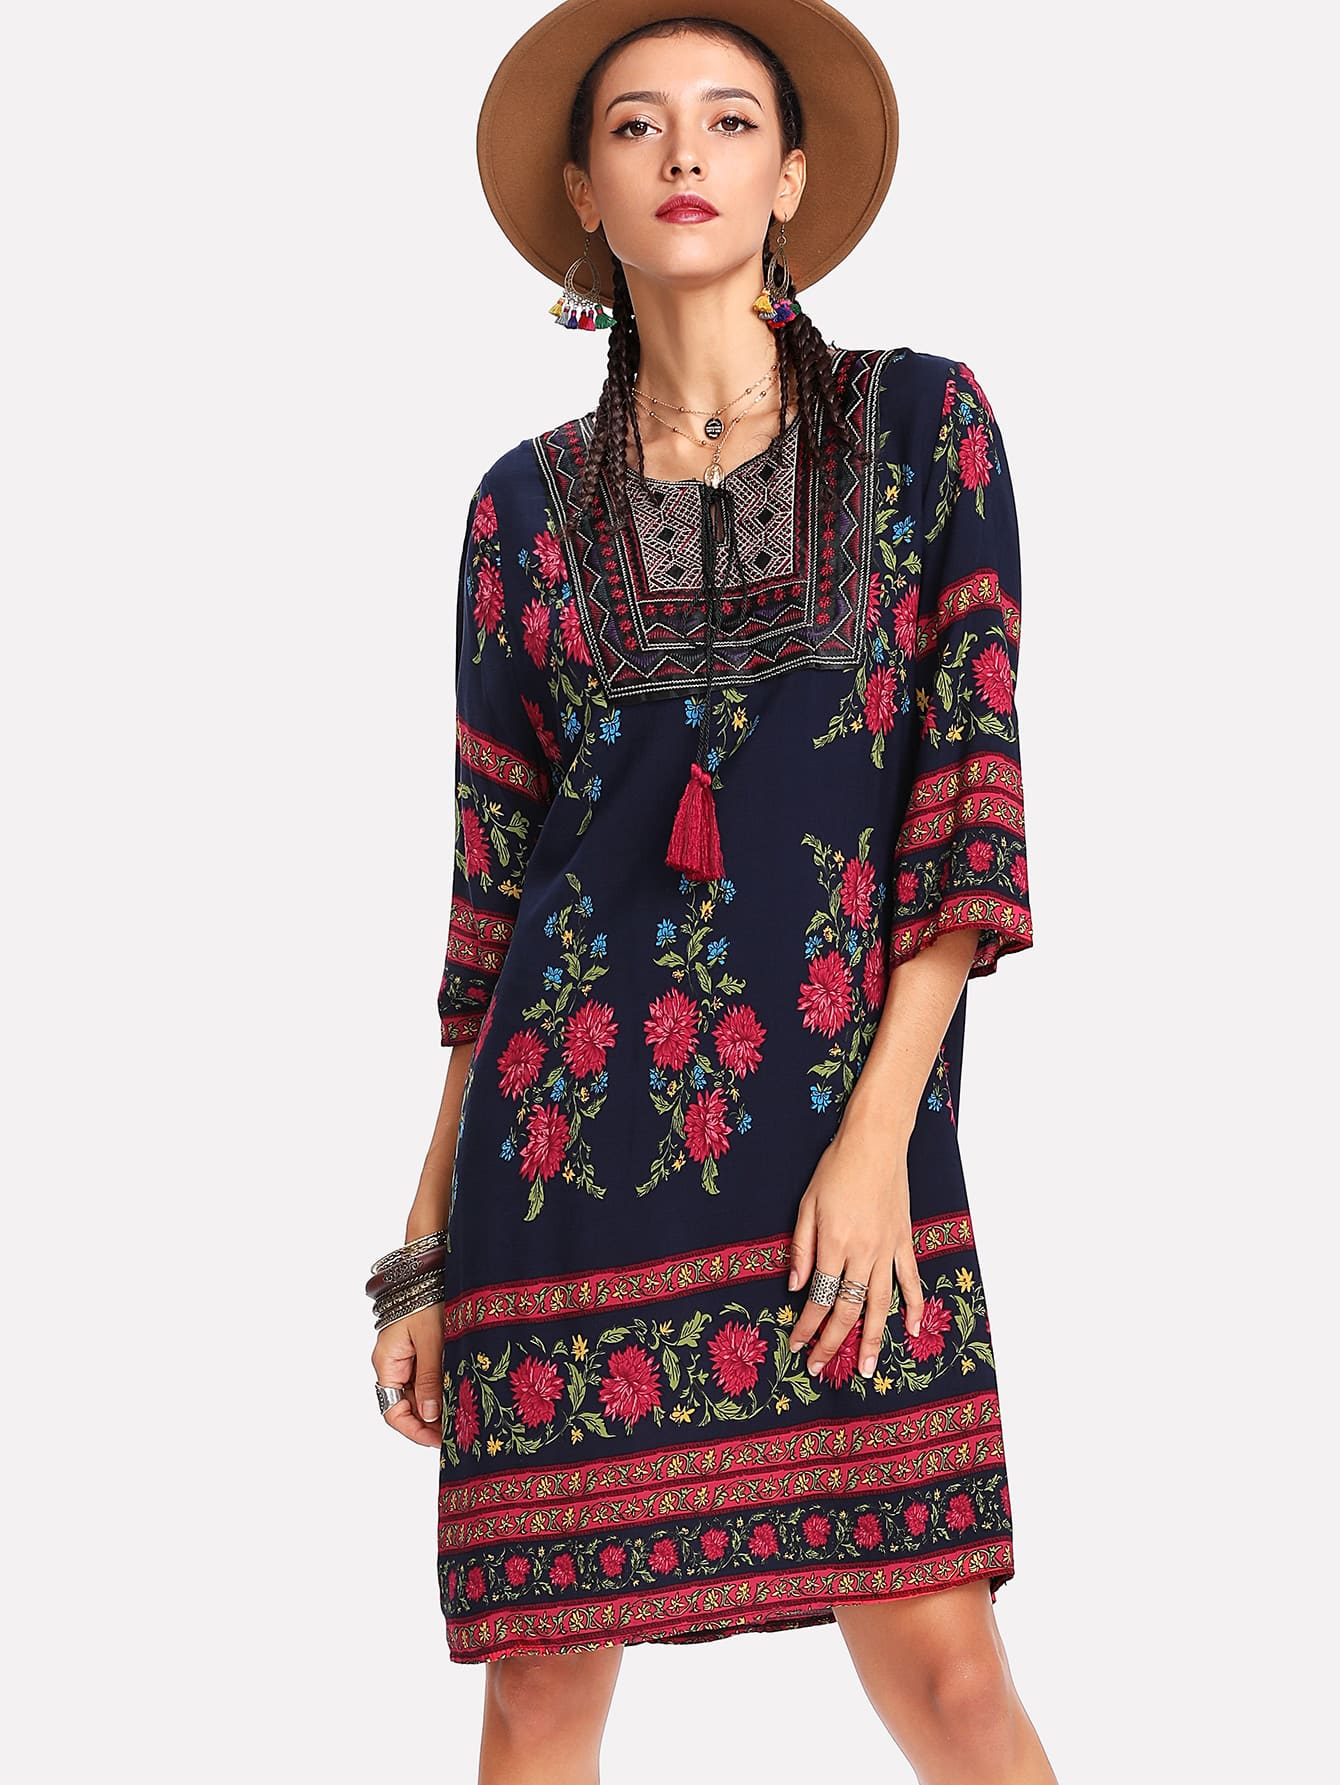 Botanical Print Tassel Tie Neck Tunic Dress все цены